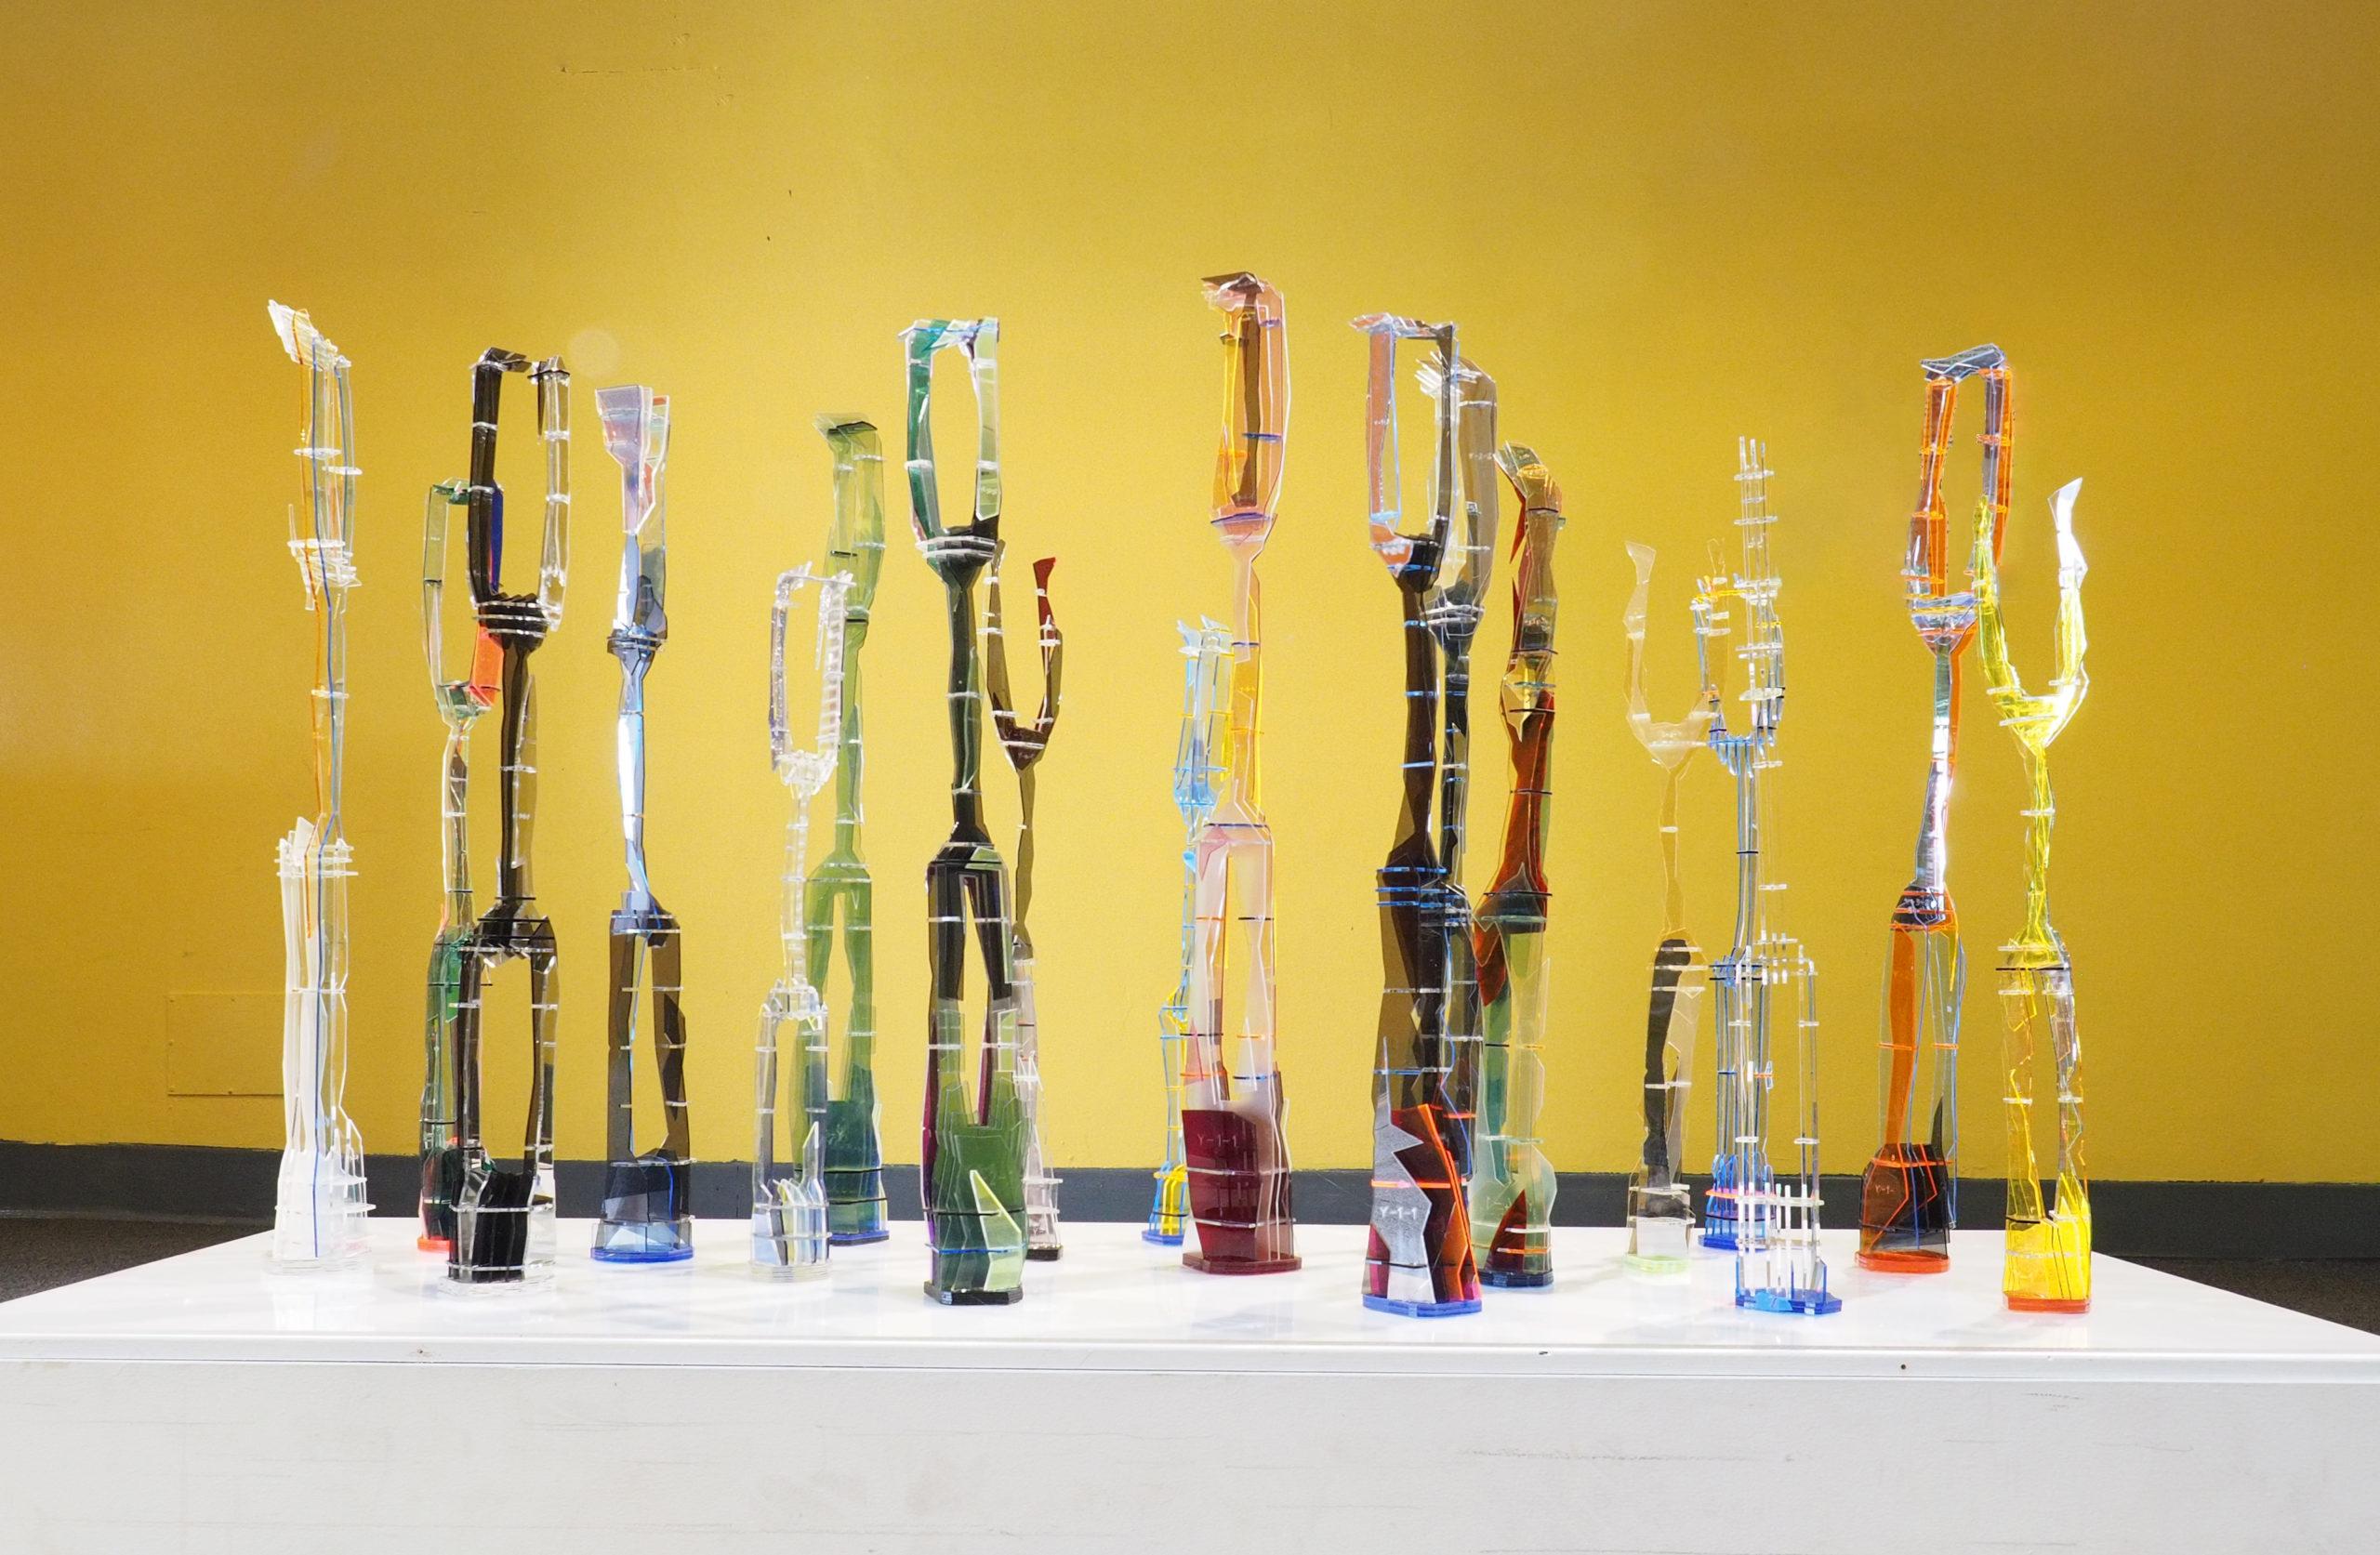 Sculptures by Roberto Visani